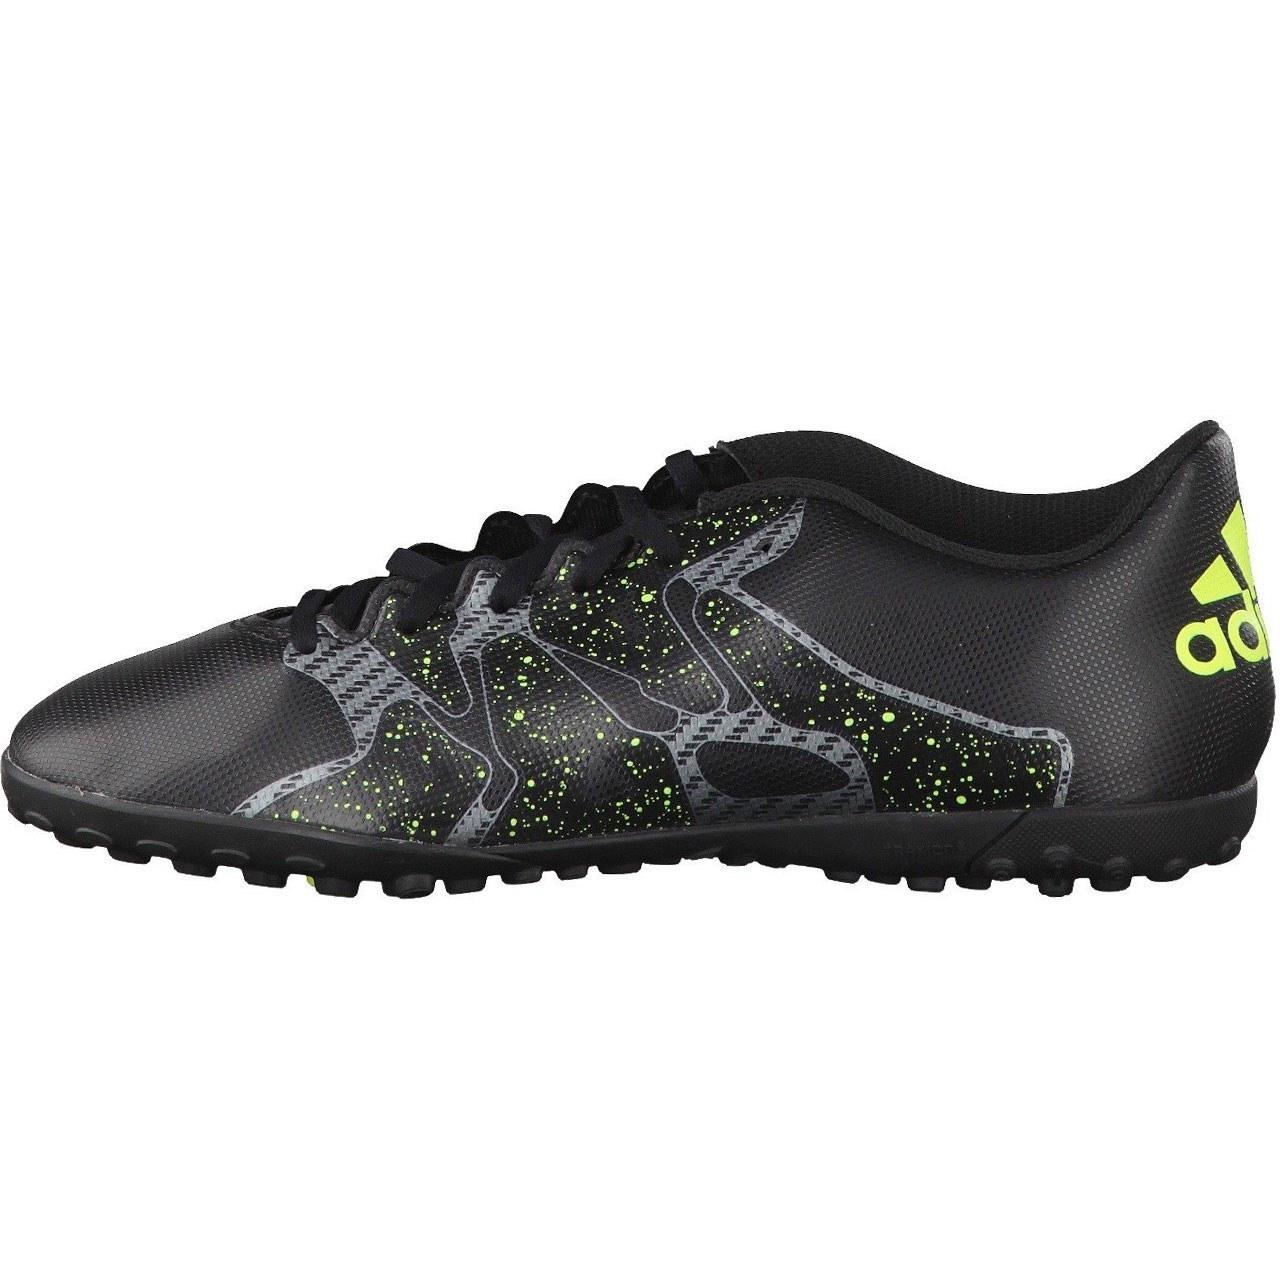 sale retailer 1f135 26eca کفش فوتبال مردانه آديداس مدل Chaos X 15.4